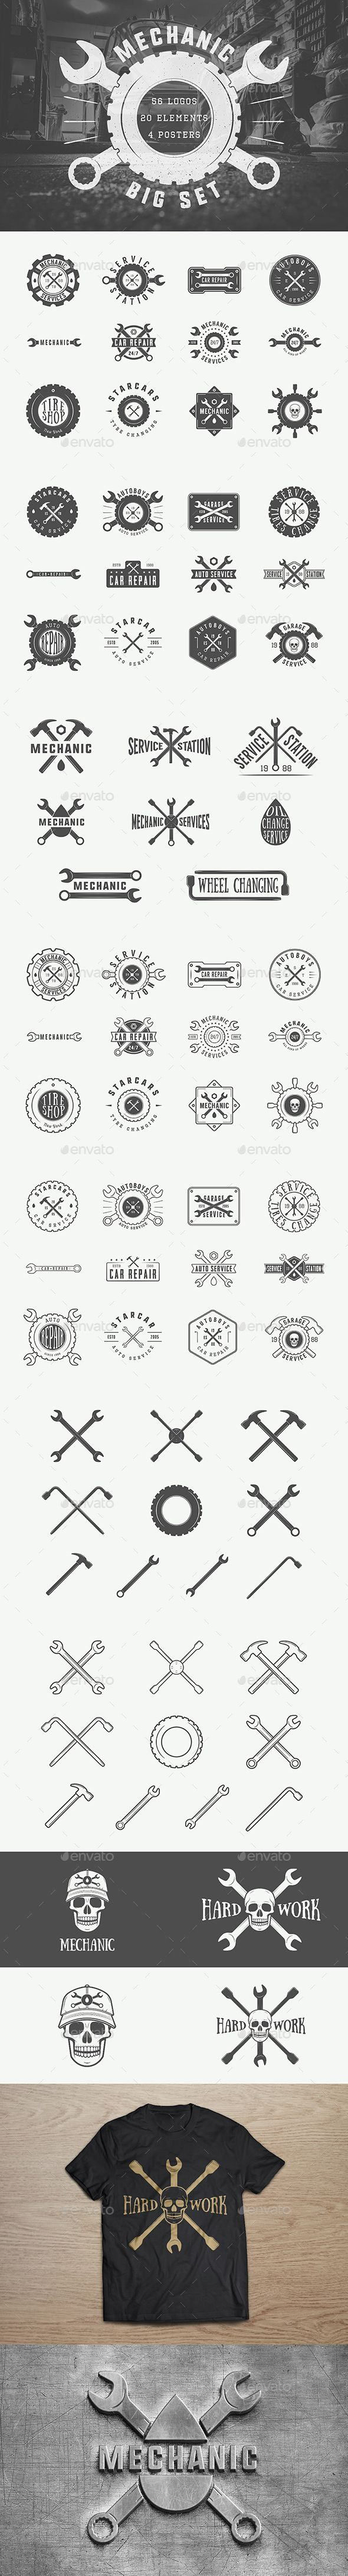 Mechanic Vintage Emblems Template PSD, Vector EPS, AI Illustrator